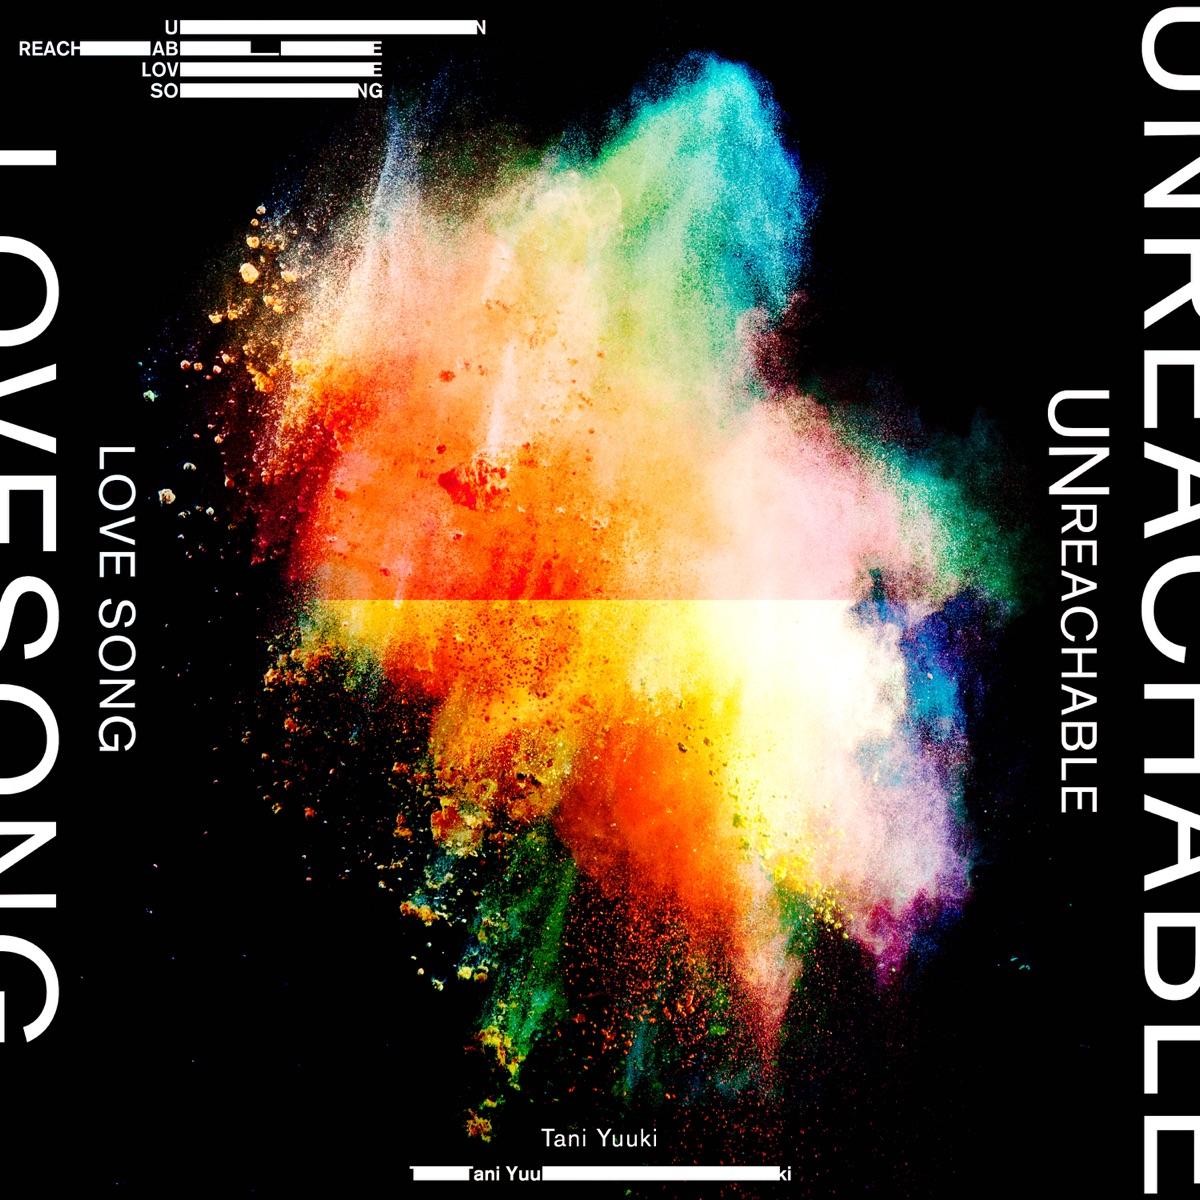 『Tani Yuuki - Unreachable love song』収録の『Unreachable love song』ジャケット